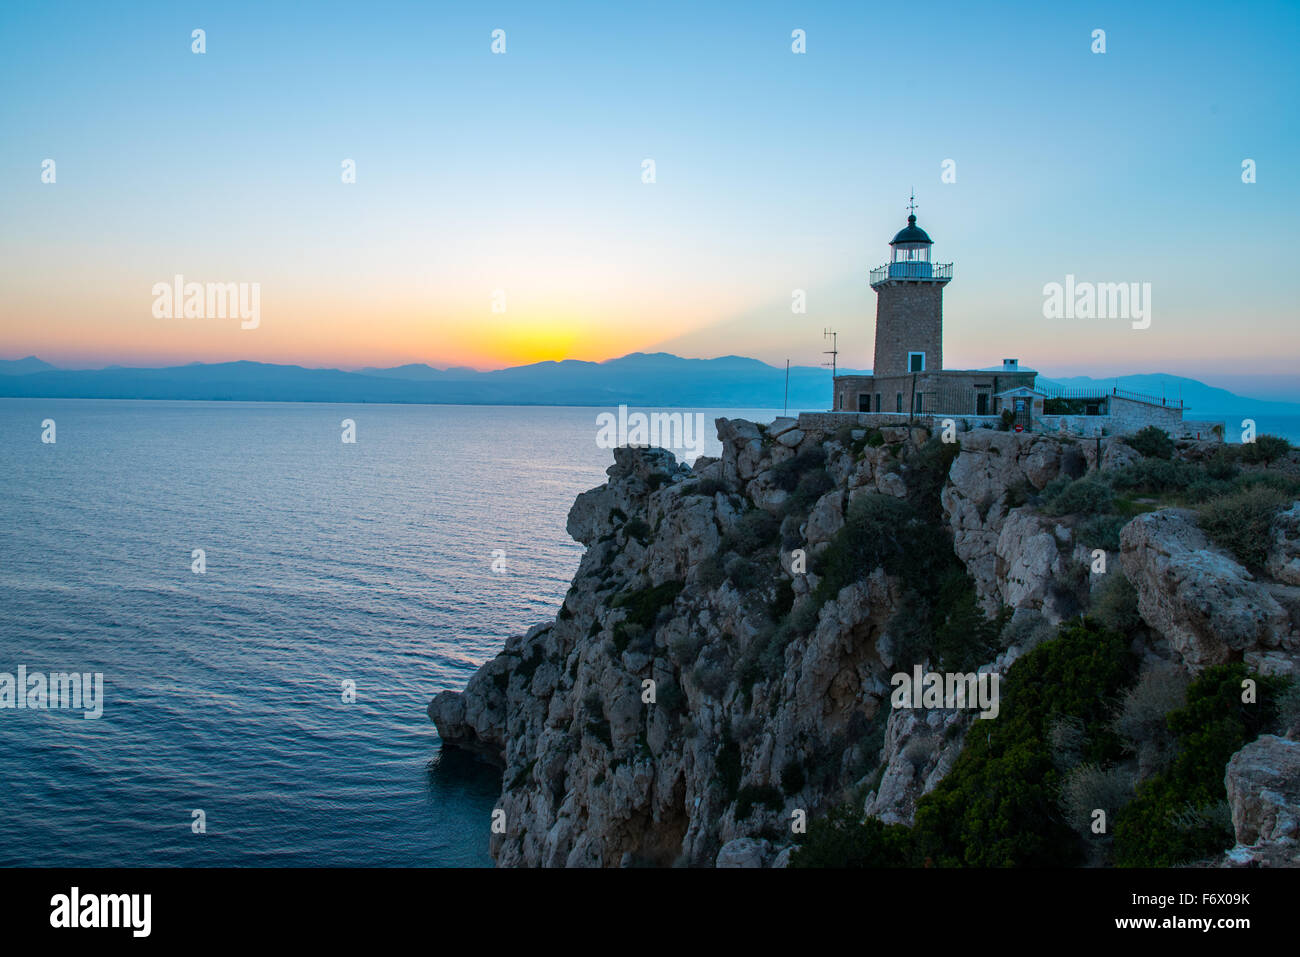 Lighthouse at Melagavi Cape near Loutraki in Greece! Stock Photo